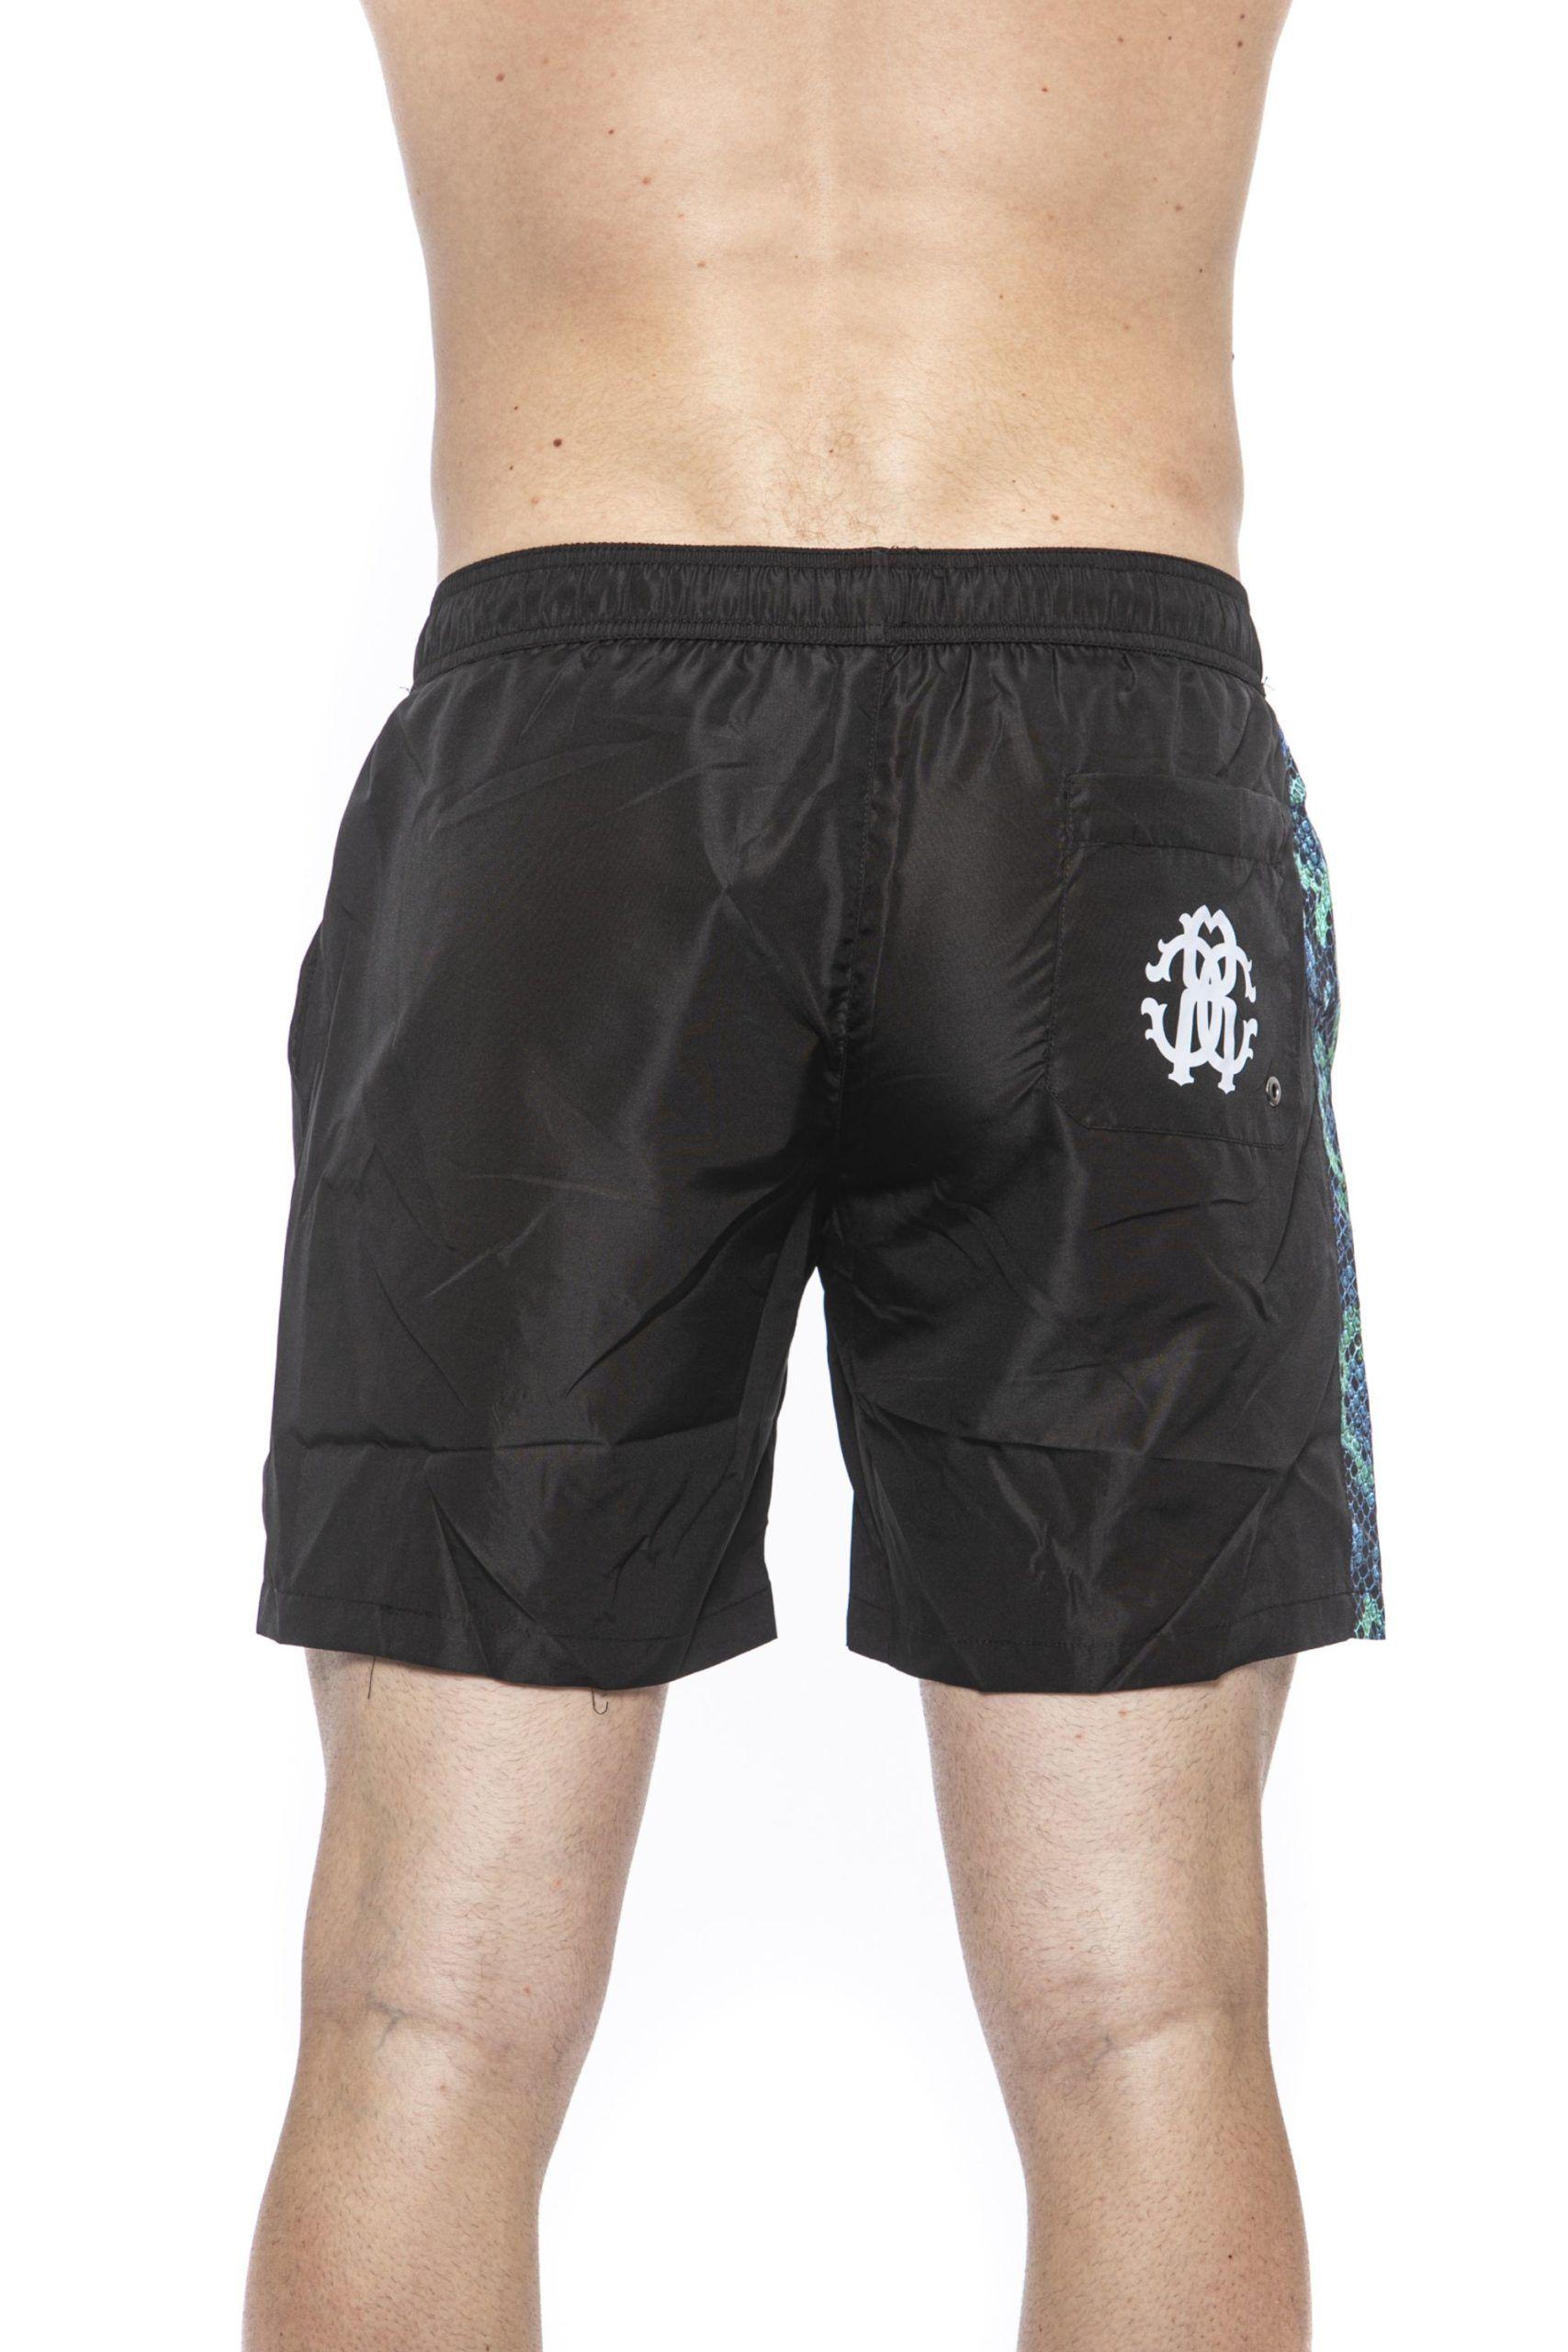 Roberto Cavalli Beachwear Black Beachwear Boxer. Side Band And Python Print. Internal Net. Back Pocket With Logo.